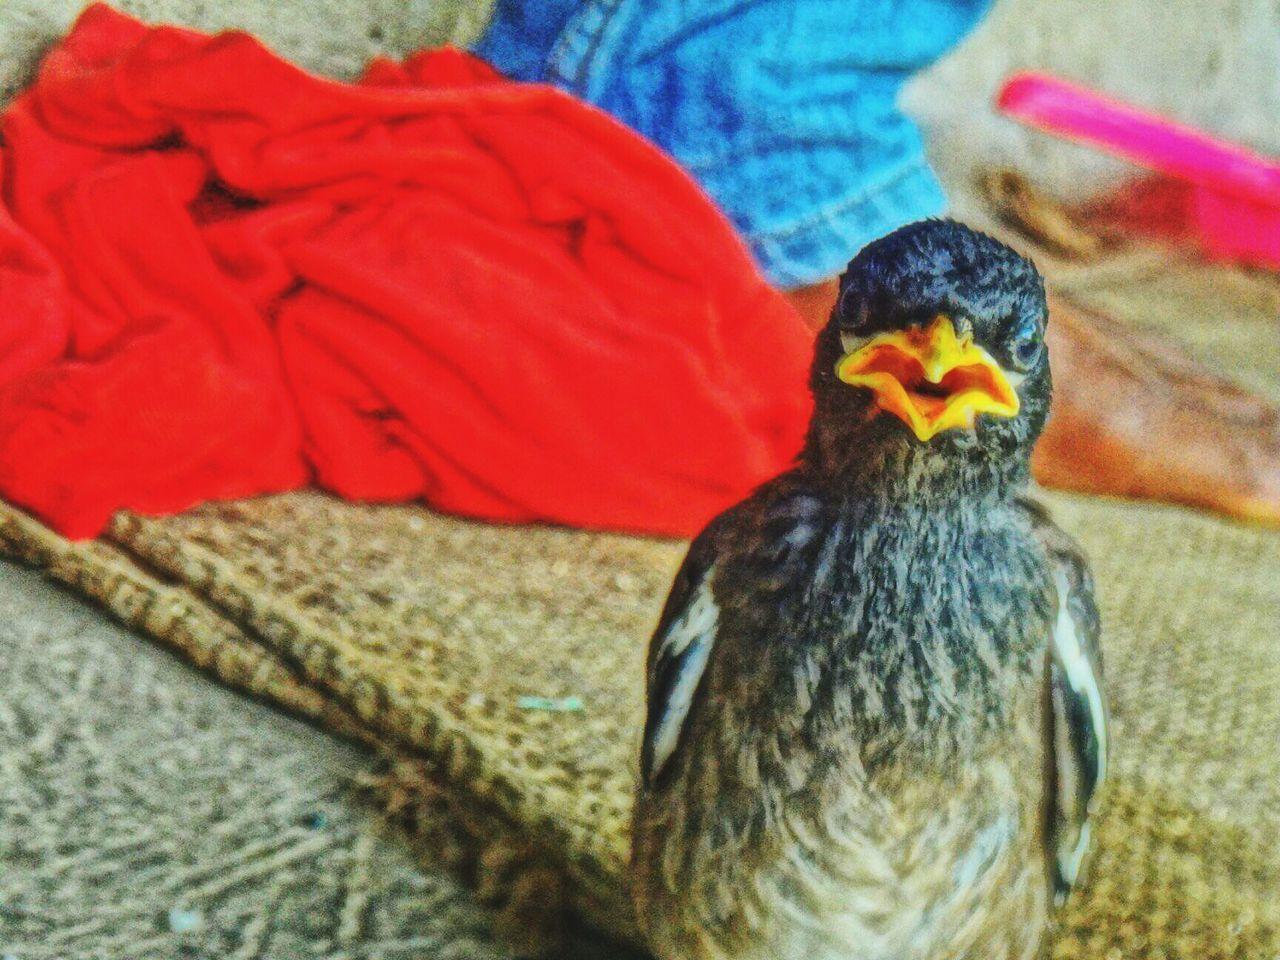 bird, animal themes, animals in the wild, one animal, animal wildlife, no people, close-up, beak, day, indoors, nature